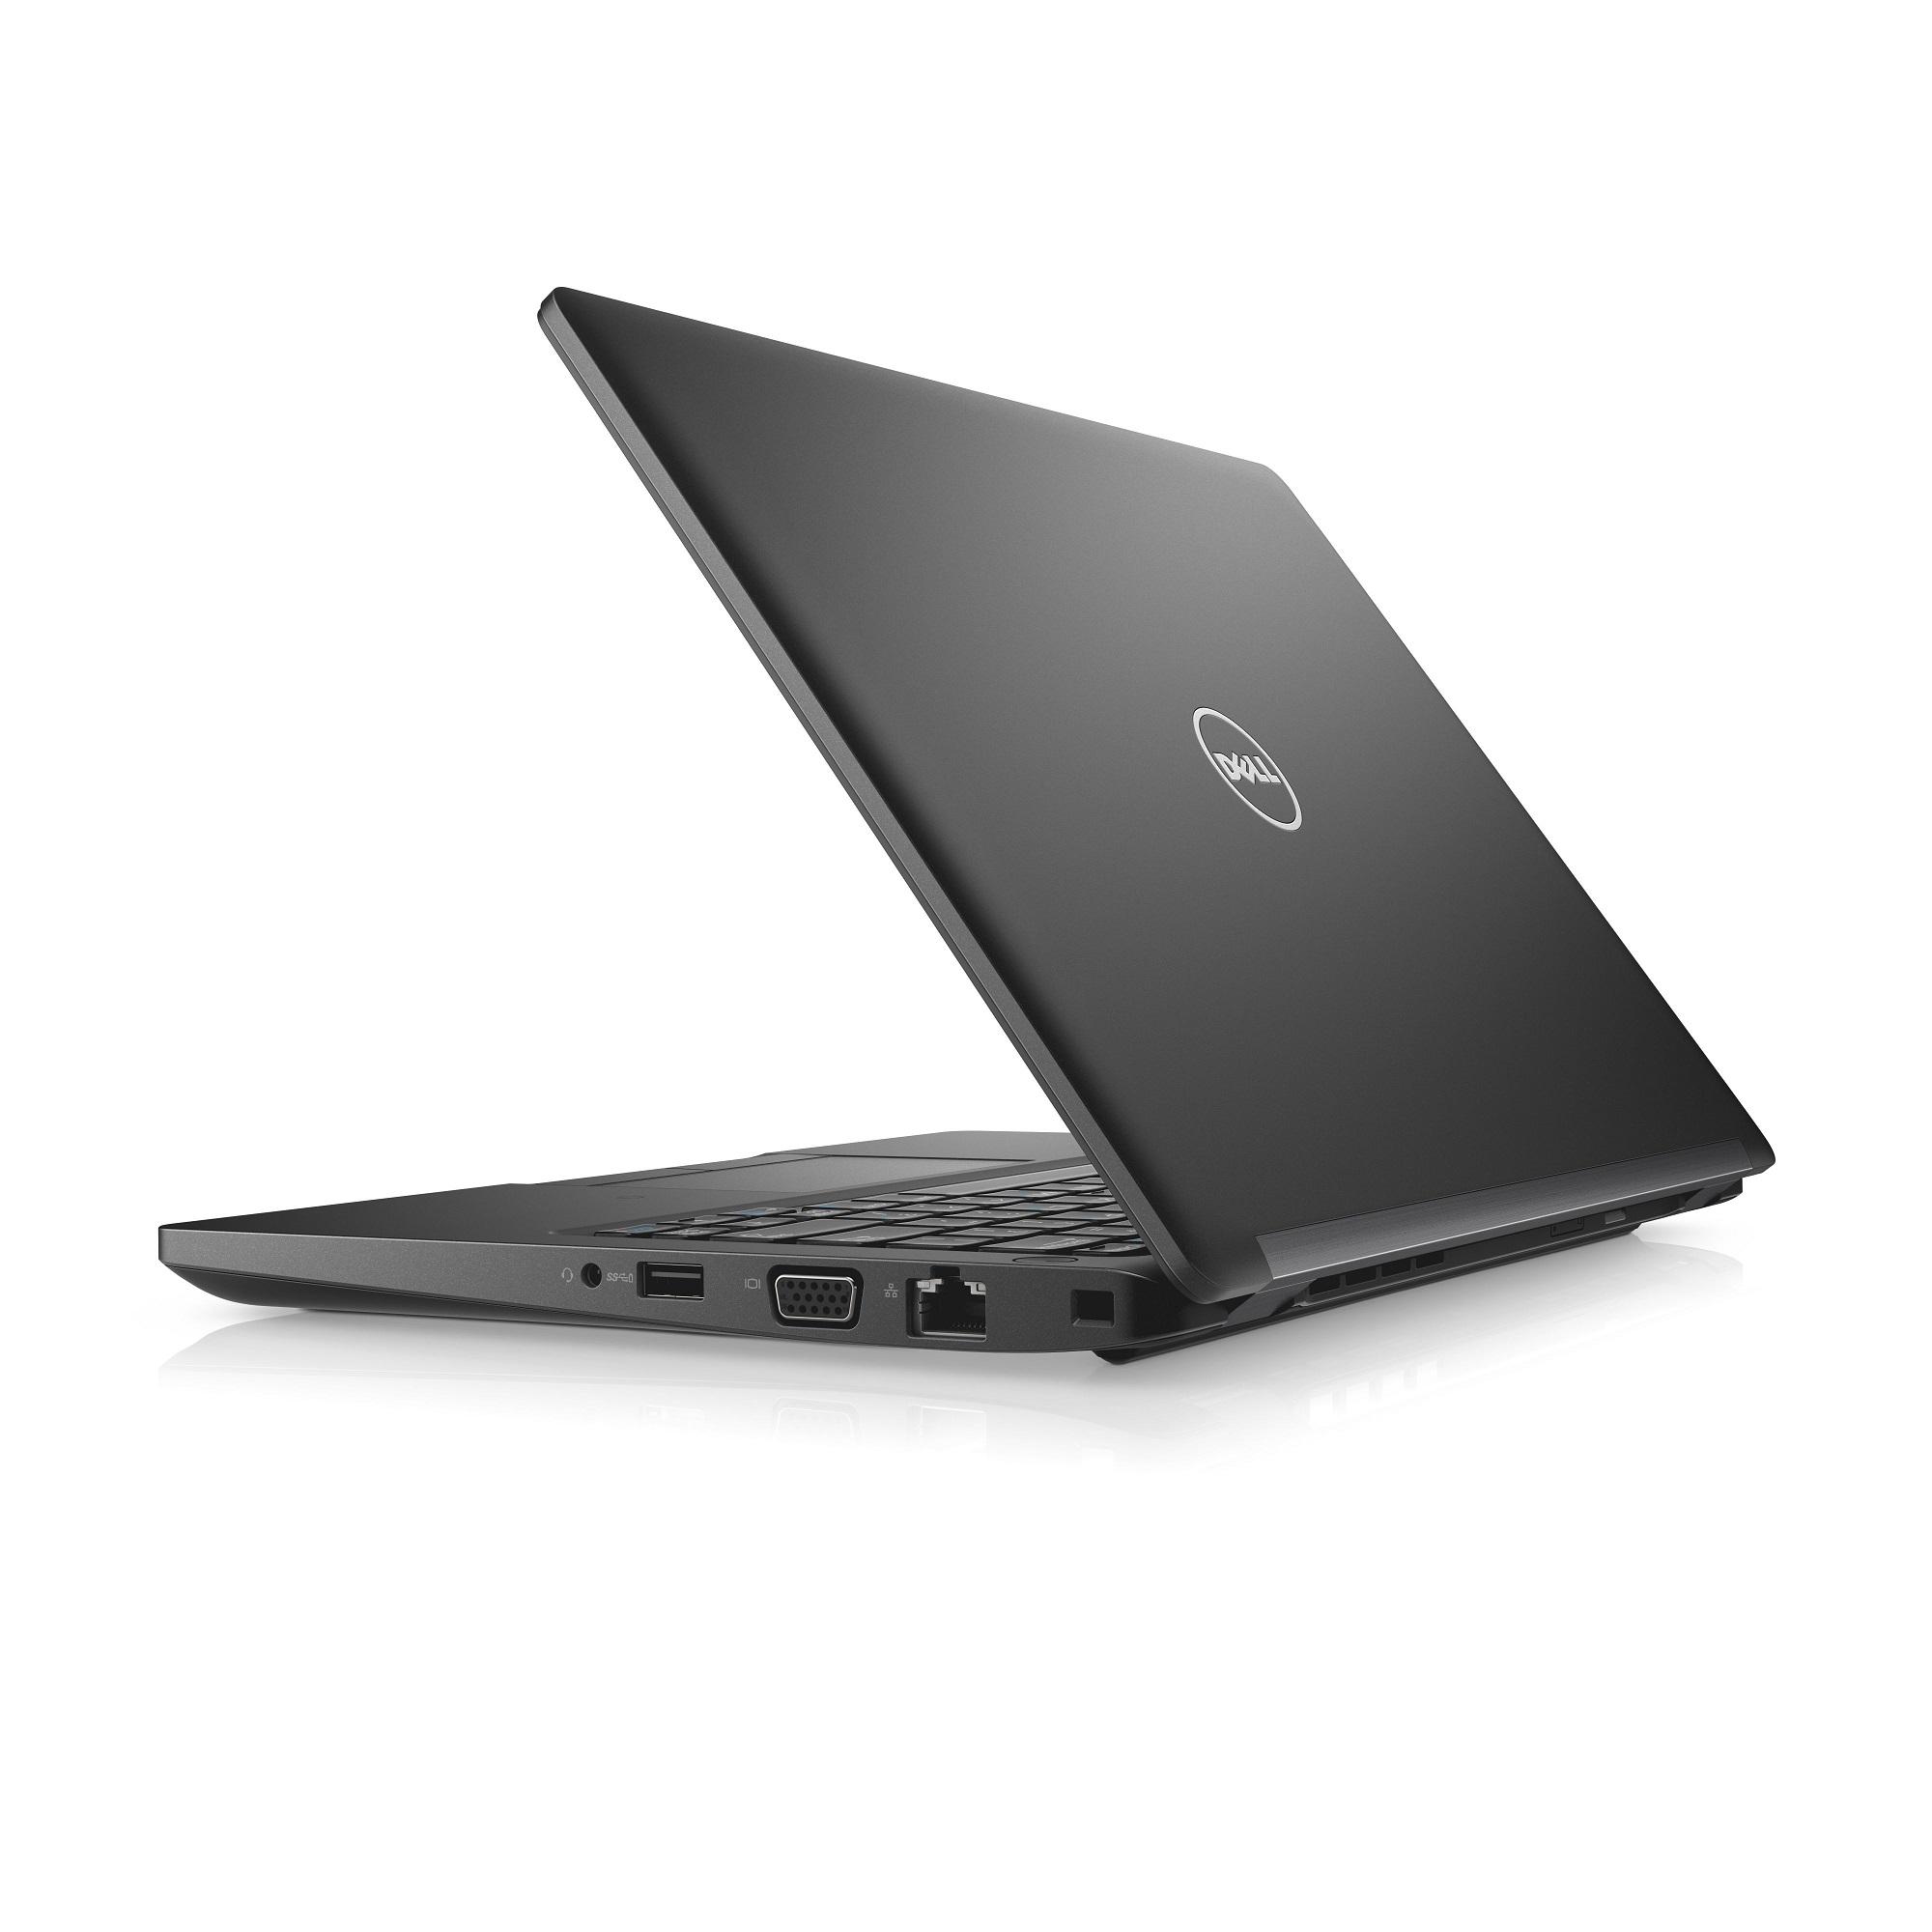 "Dell Latitude 5280 12"" FHD i7-7600U/8G/256GB SSD/MCR/HDMI/VGA/USB-C/LTE/W10P/3RNBD/Černý"